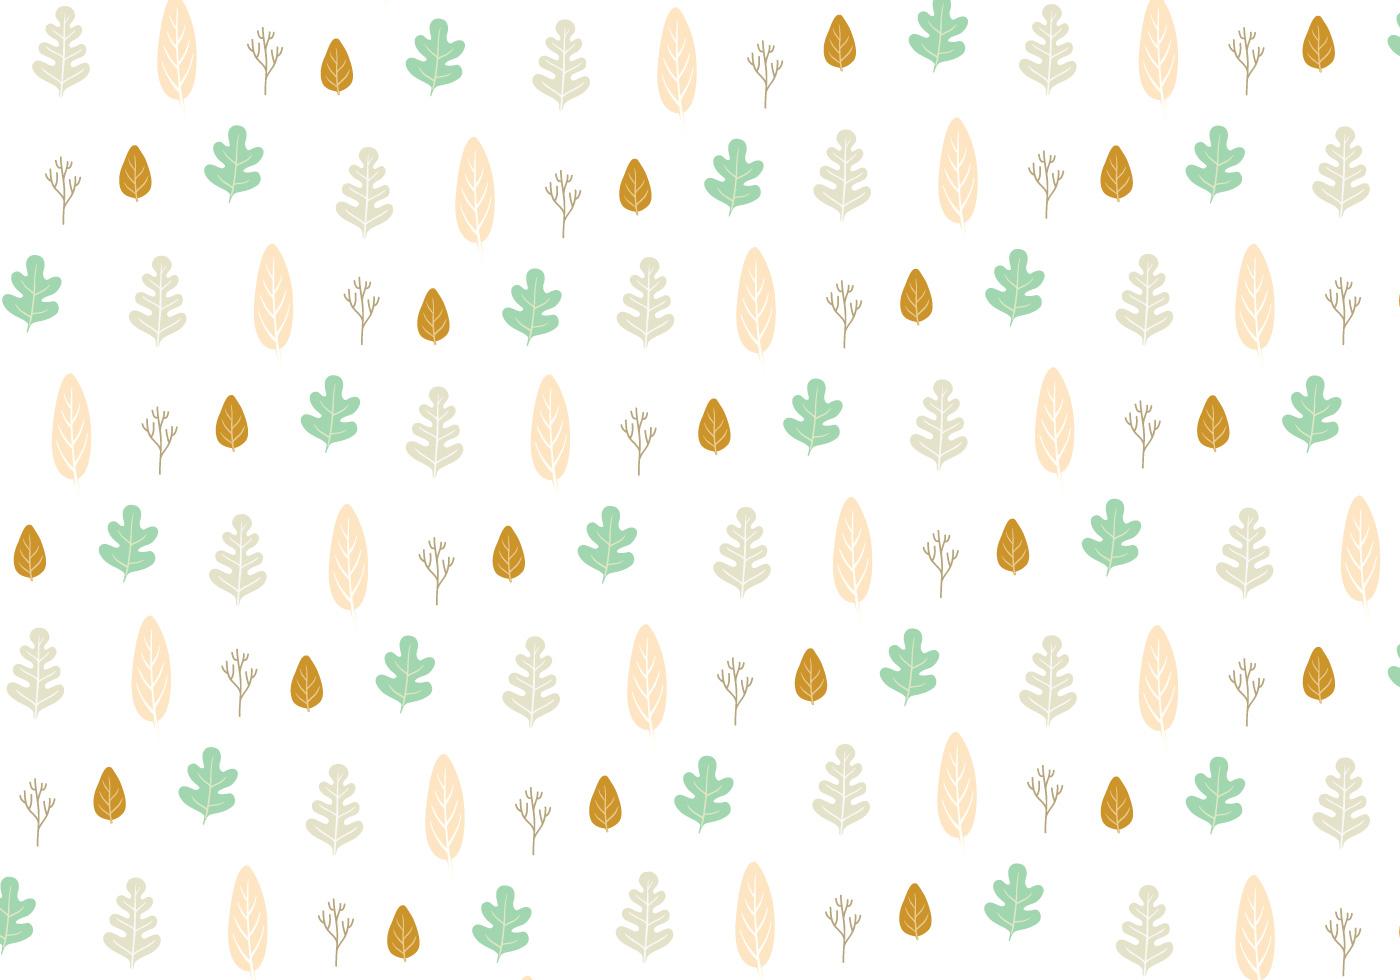 leaf icon pattern background